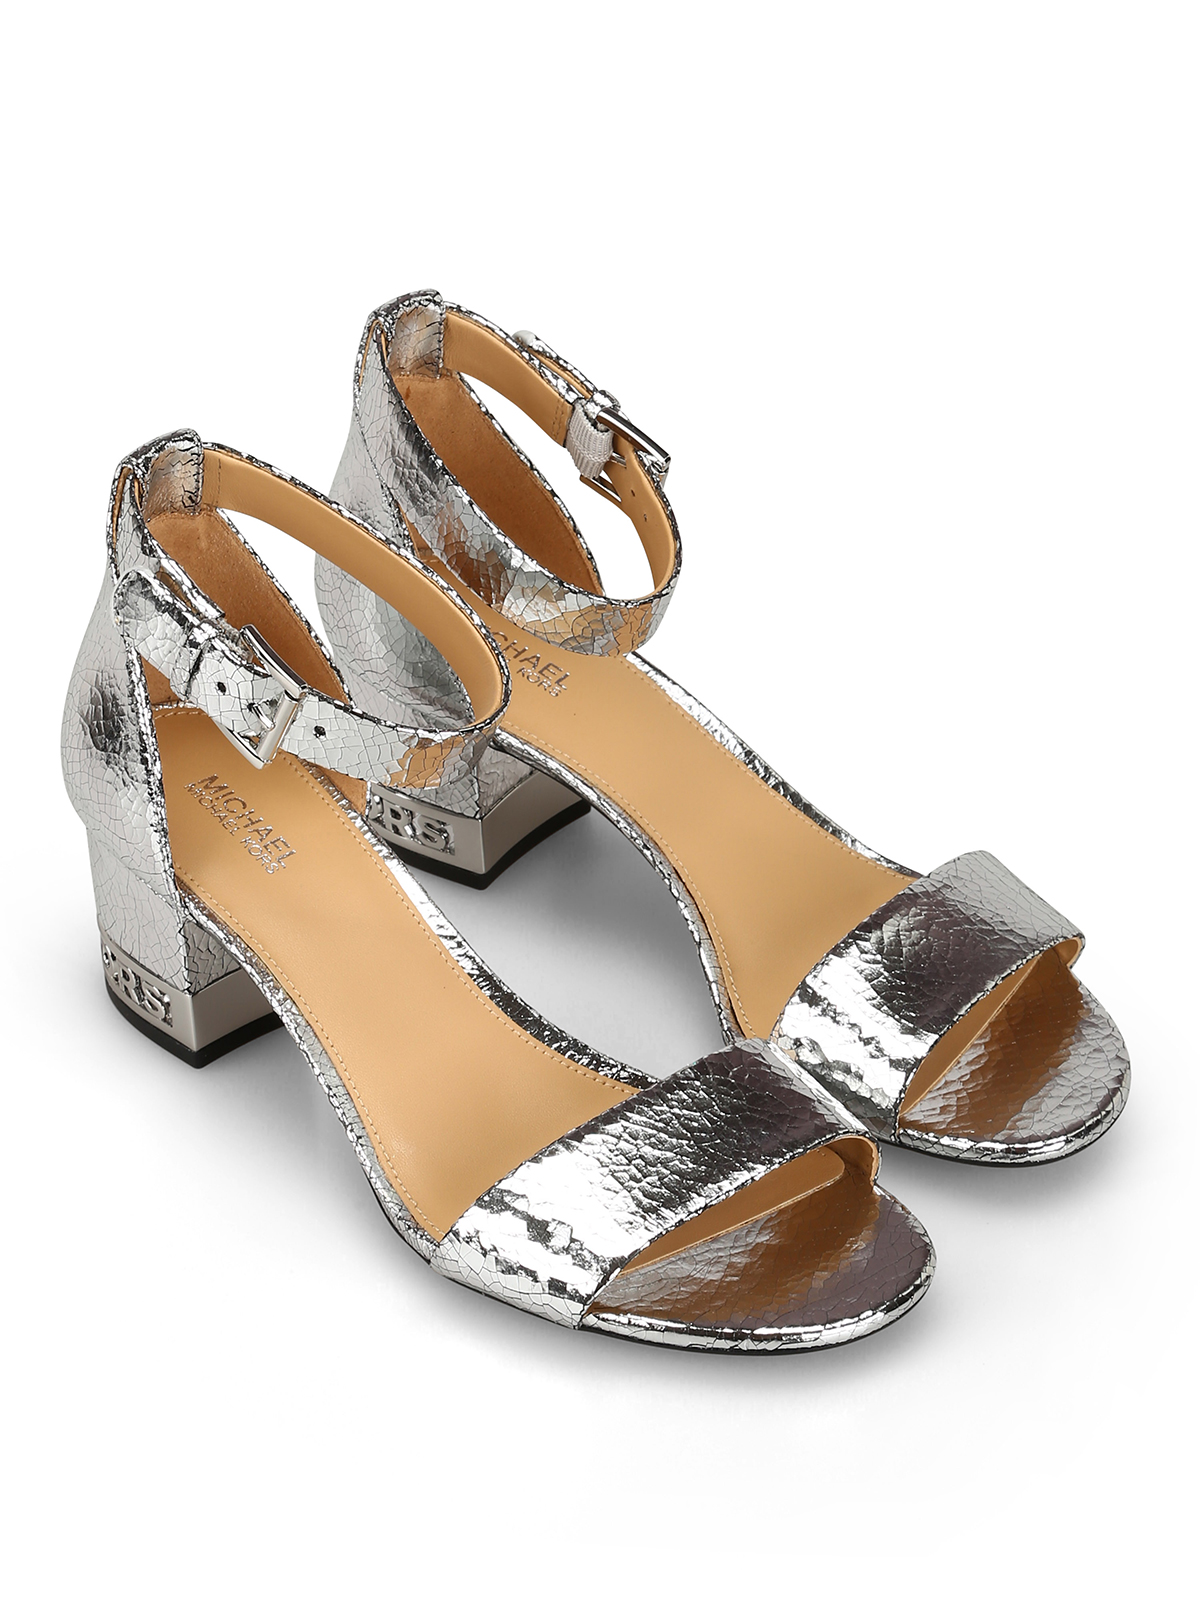 MICHAEL Michael Kors Berkley Sandals | Dillards